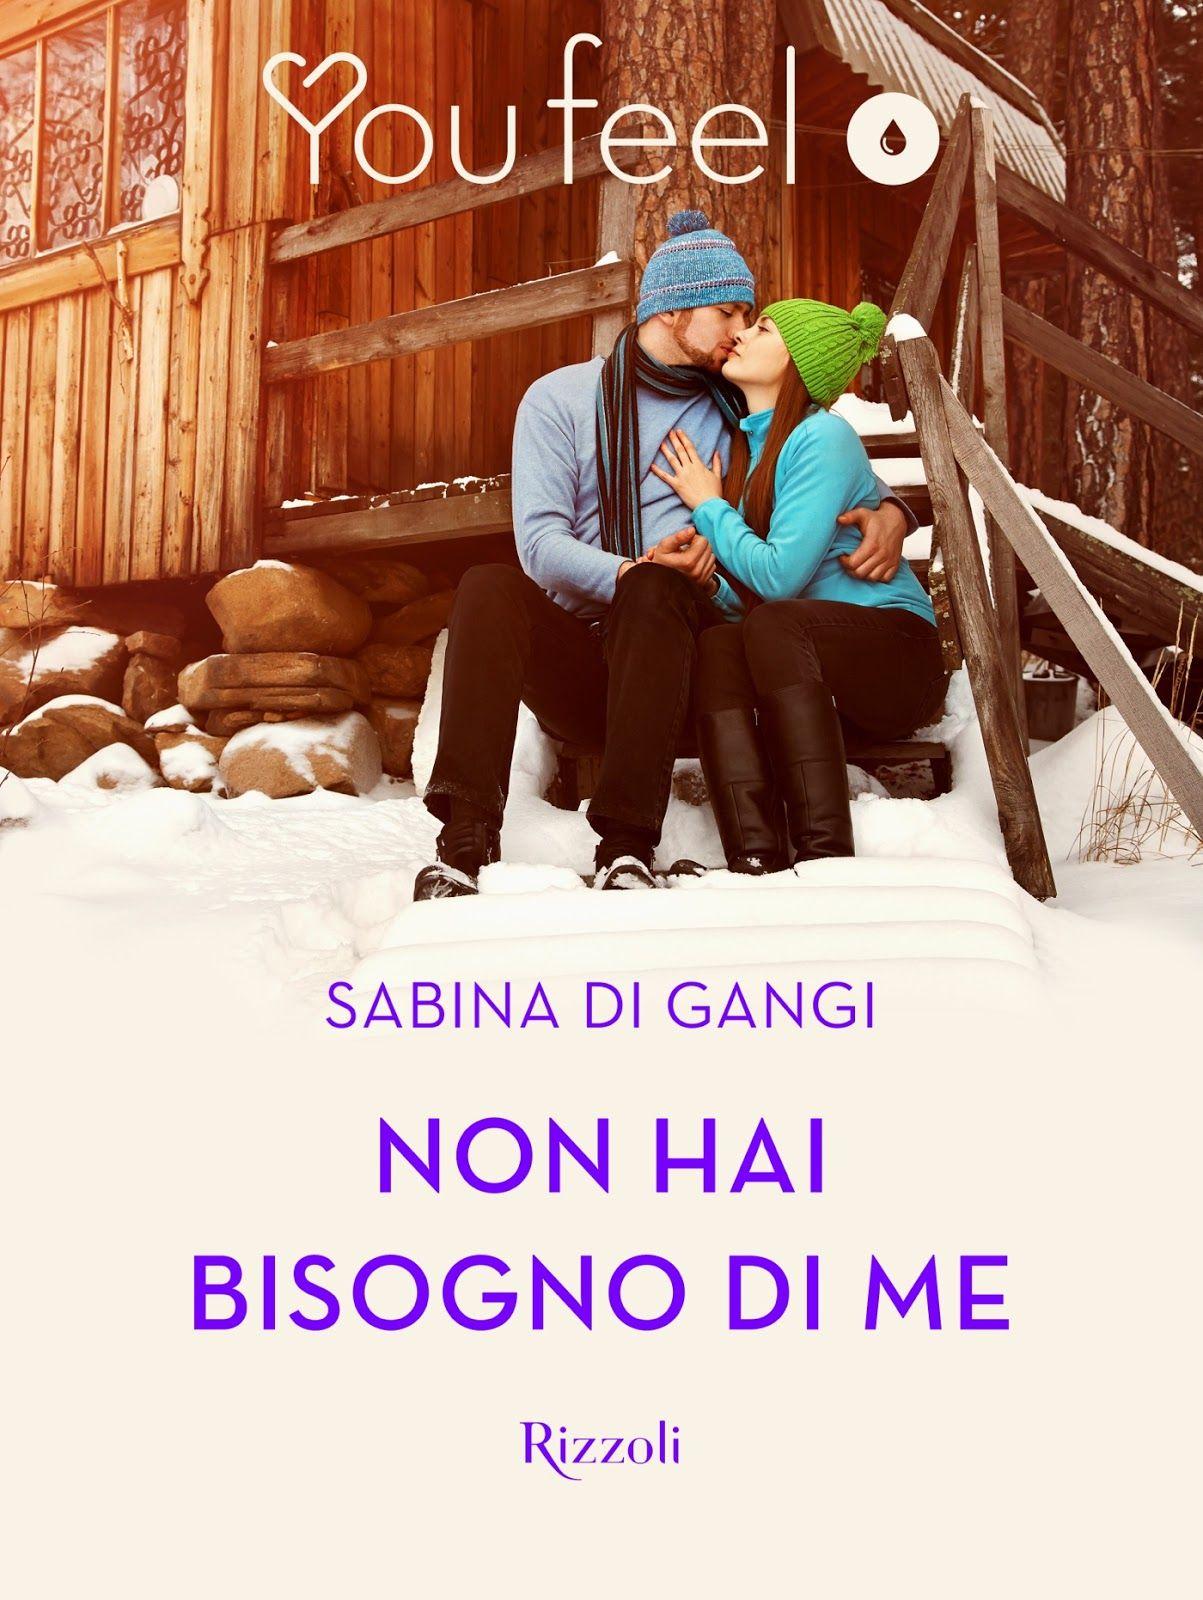 Segnalazione - NON HAI BISOGNO DI ME di Sabina Di Gangi http://lindabertasi.blogspot.it/2016/11/segnalazione-non-hai-bisogno-di-me-di.html